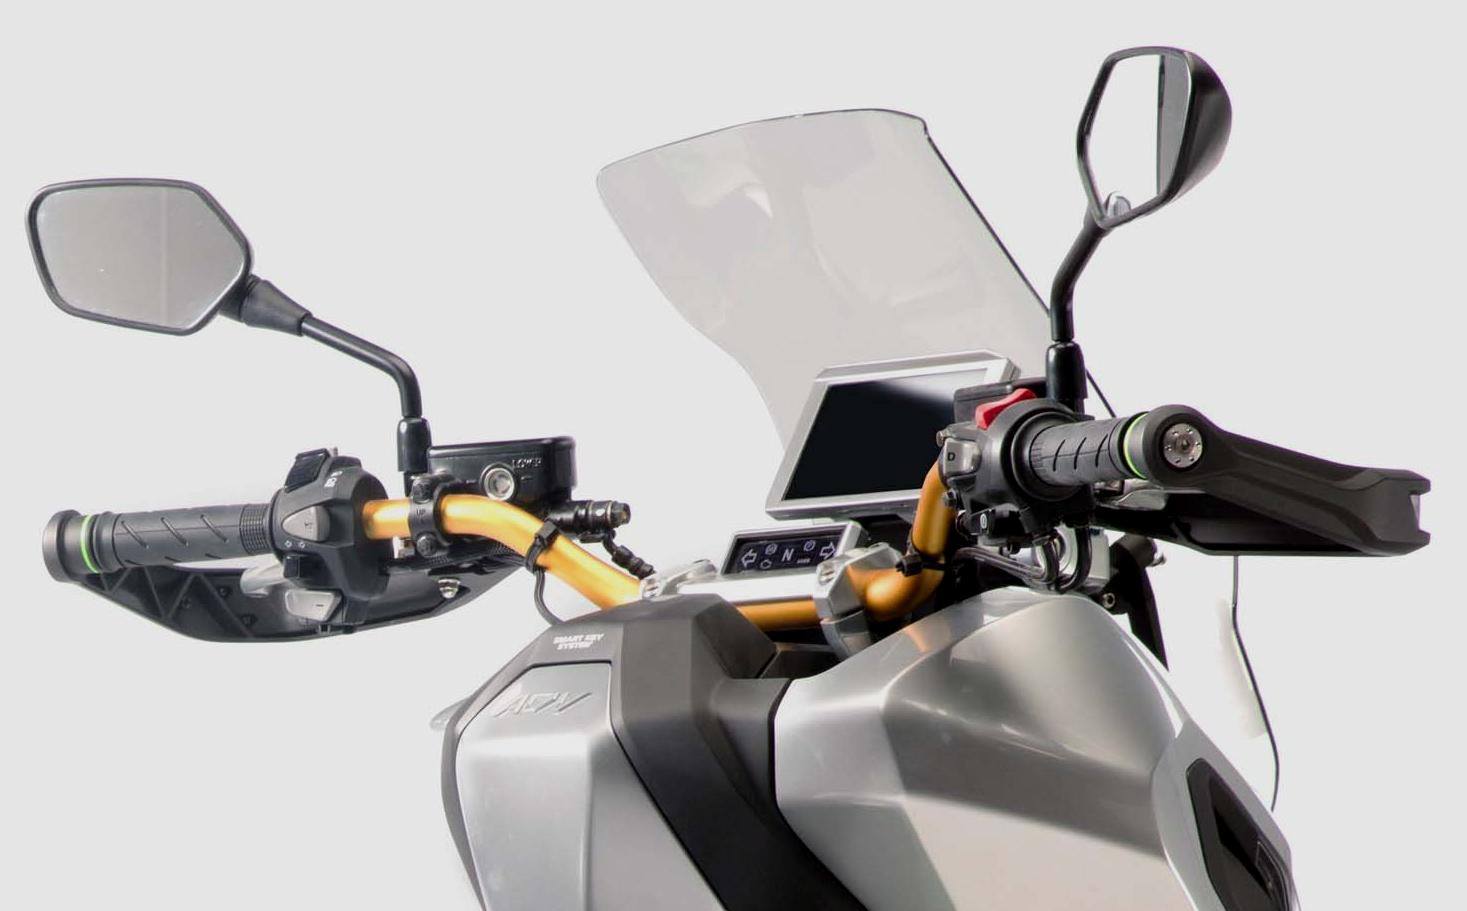 2017 Honda City Adventure Concept Motorcycle / Scooter